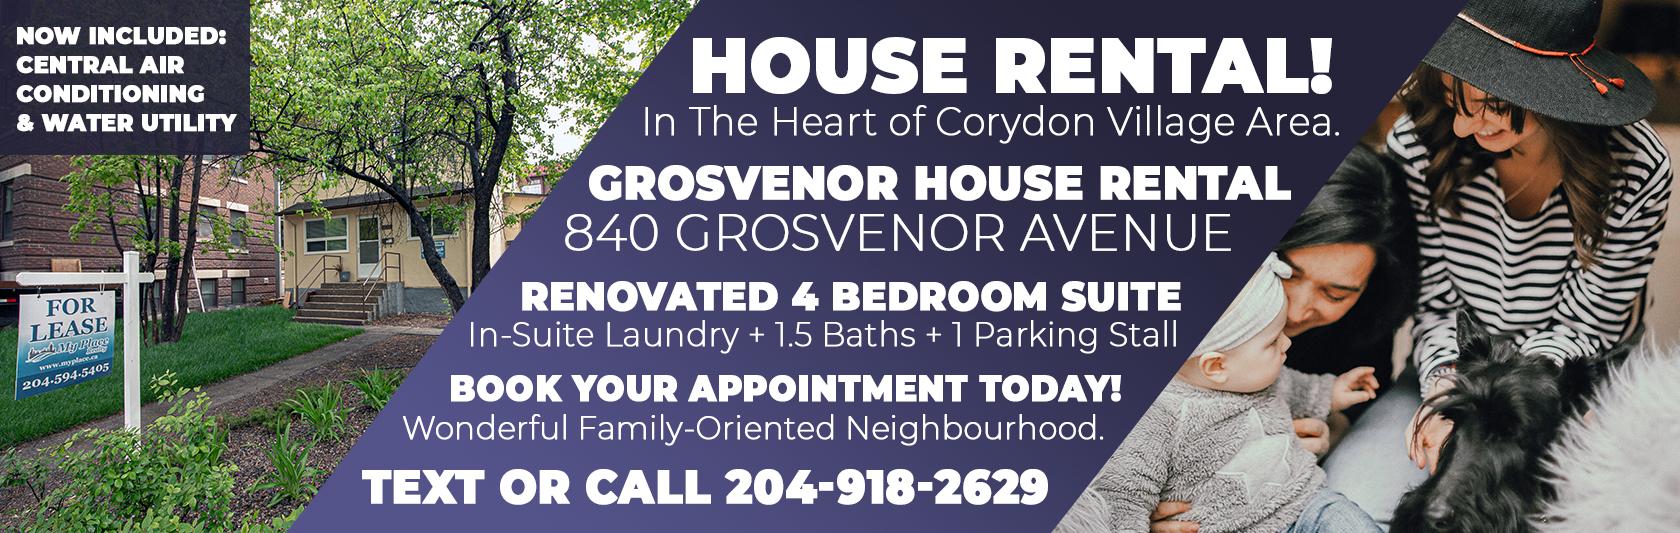 204-918-2629 - 840 Grosvenor Avenue - 4 Bedroom Suite.jpg